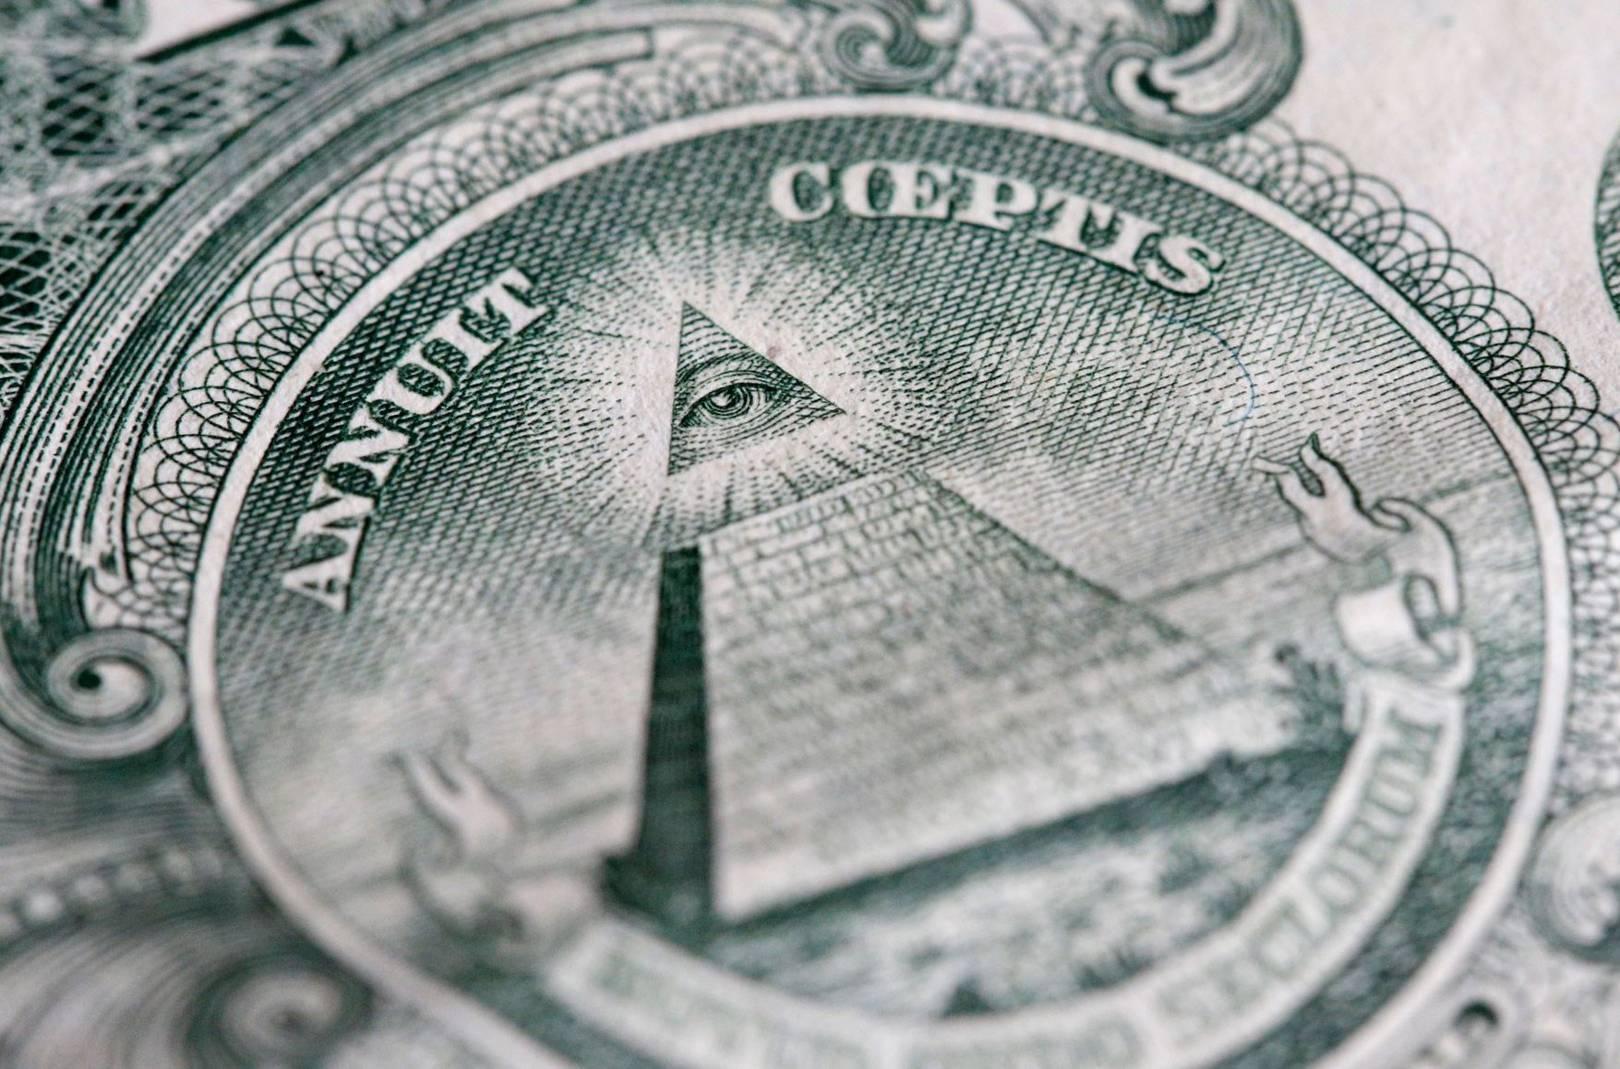 The Soviet myth about the dollar at 67 kopecks